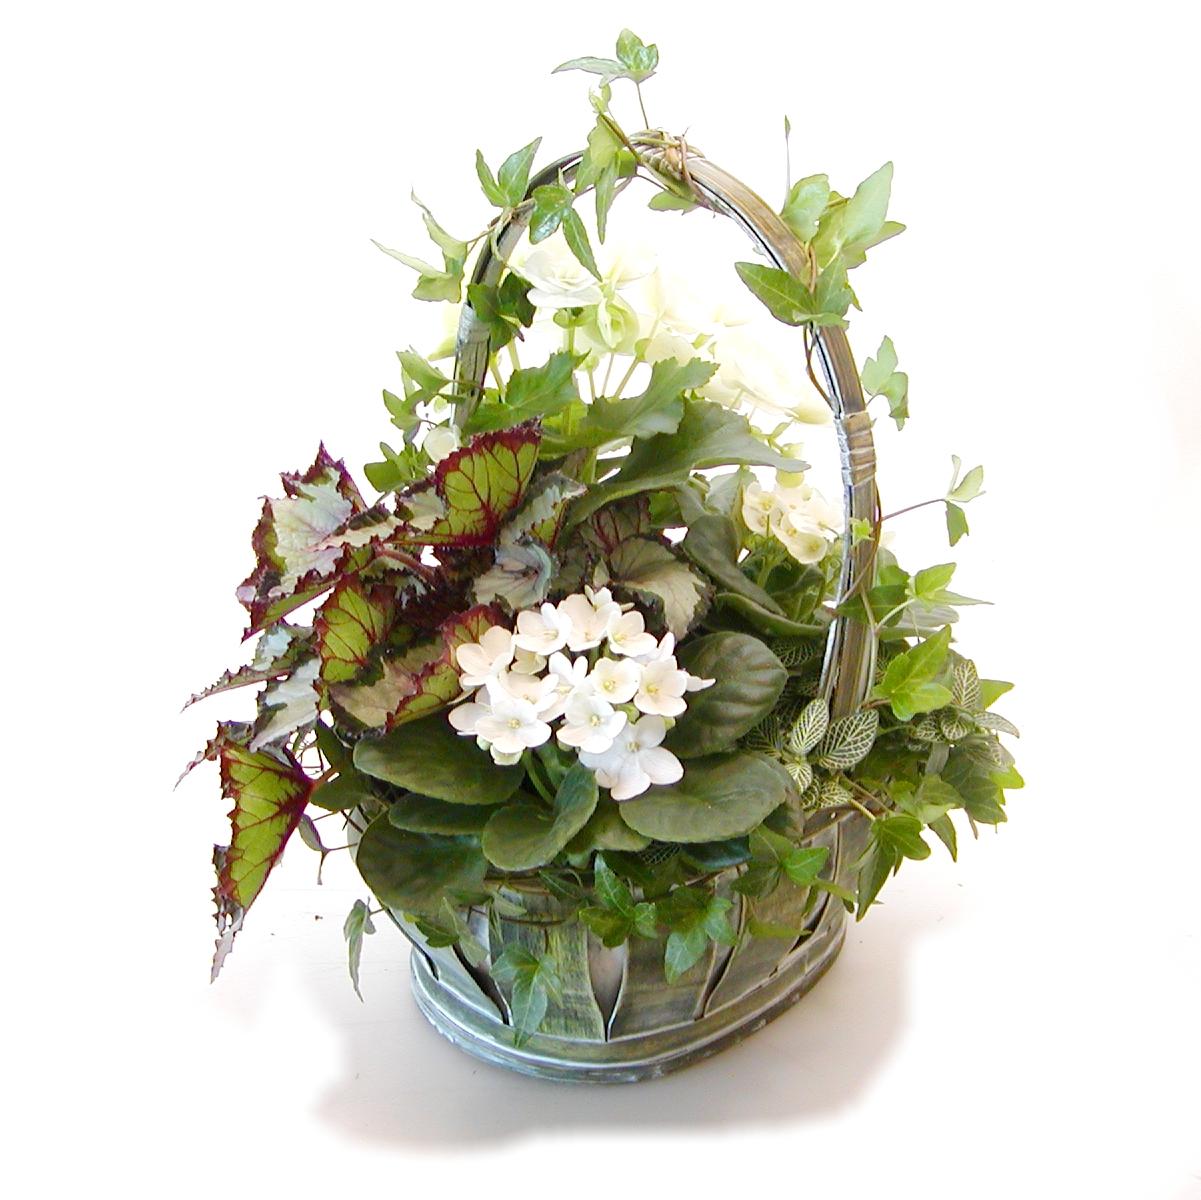 Centerpiece flower arrangements for parties for Flower arrangements for parties